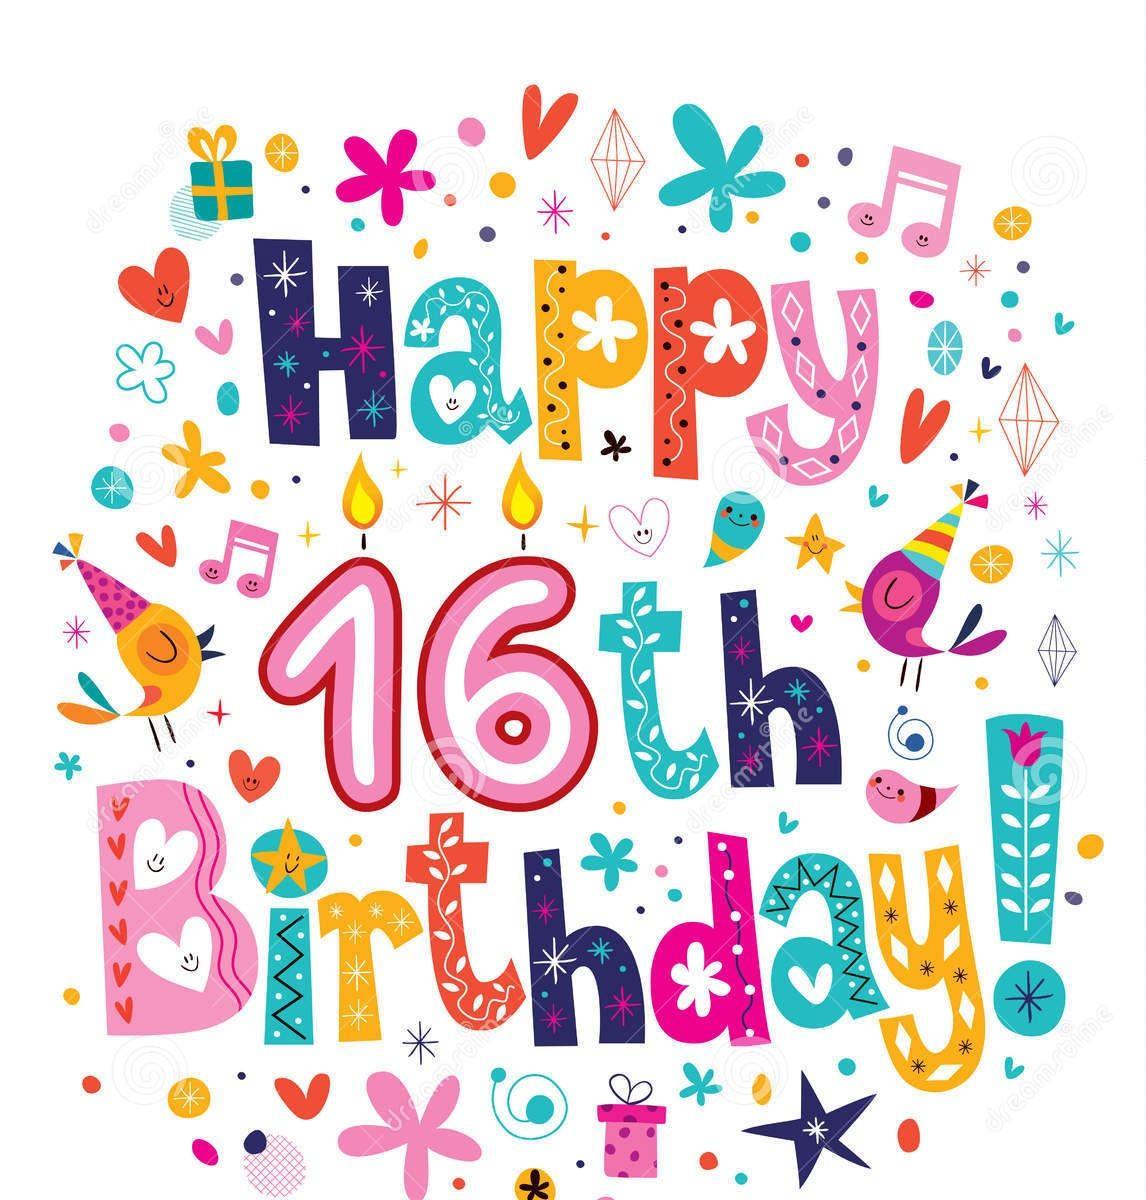 Happy 16th birthday birthday cards wishes messages happy happy 16th birthday birthday cards wishes messages m4hsunfo